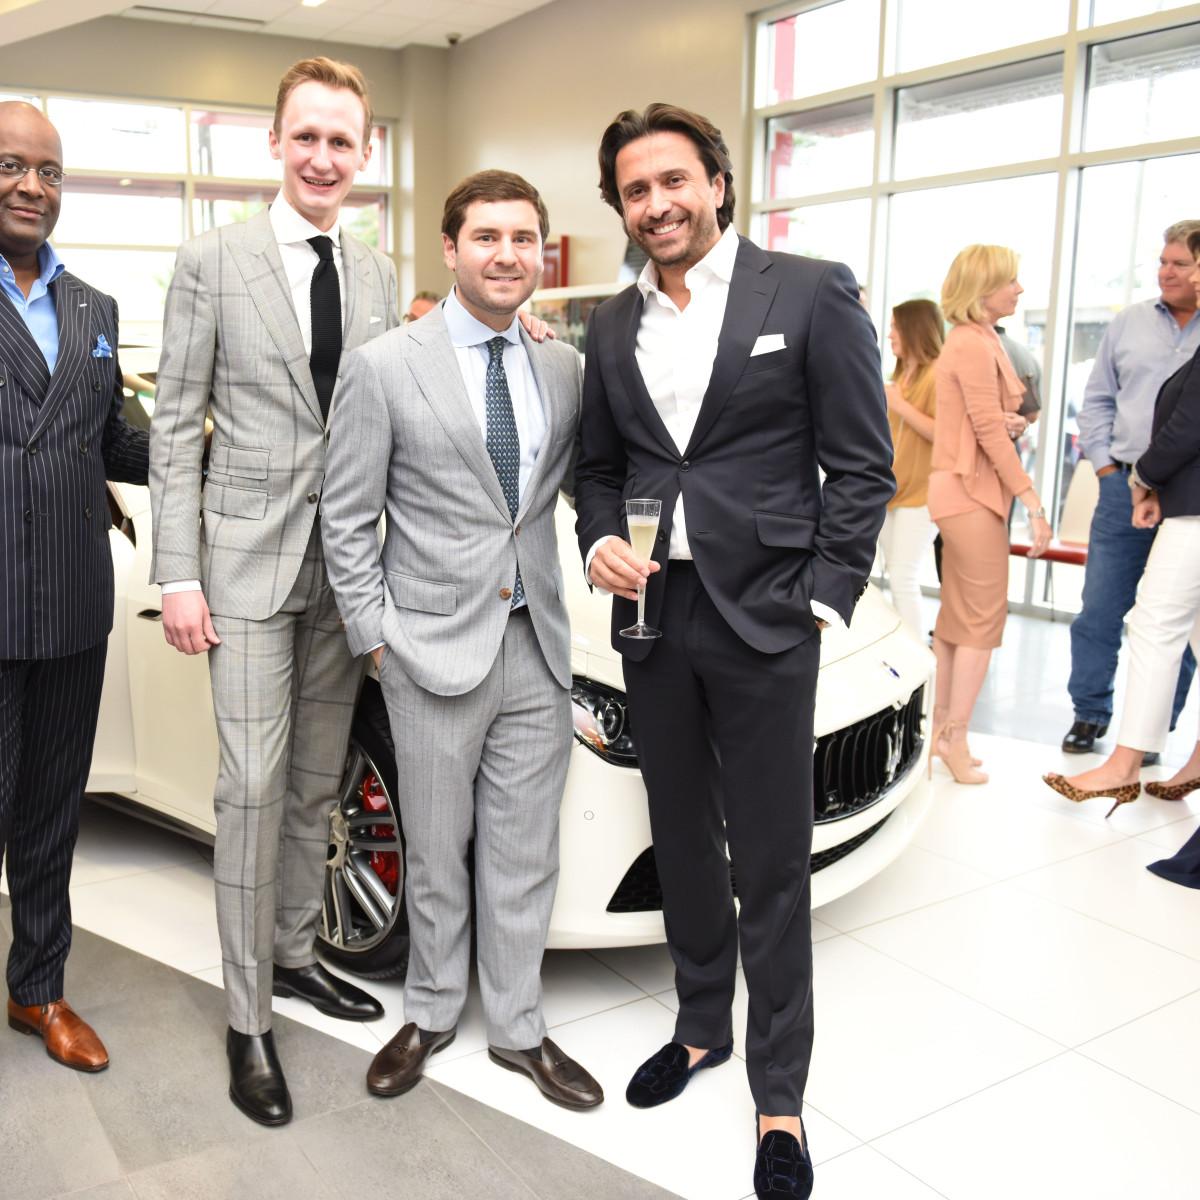 News, Shelby, Helfman Maserati opening, June 2015, Donald Walters, Clinton Wagoner, Jason Feldman, Dany Daniel